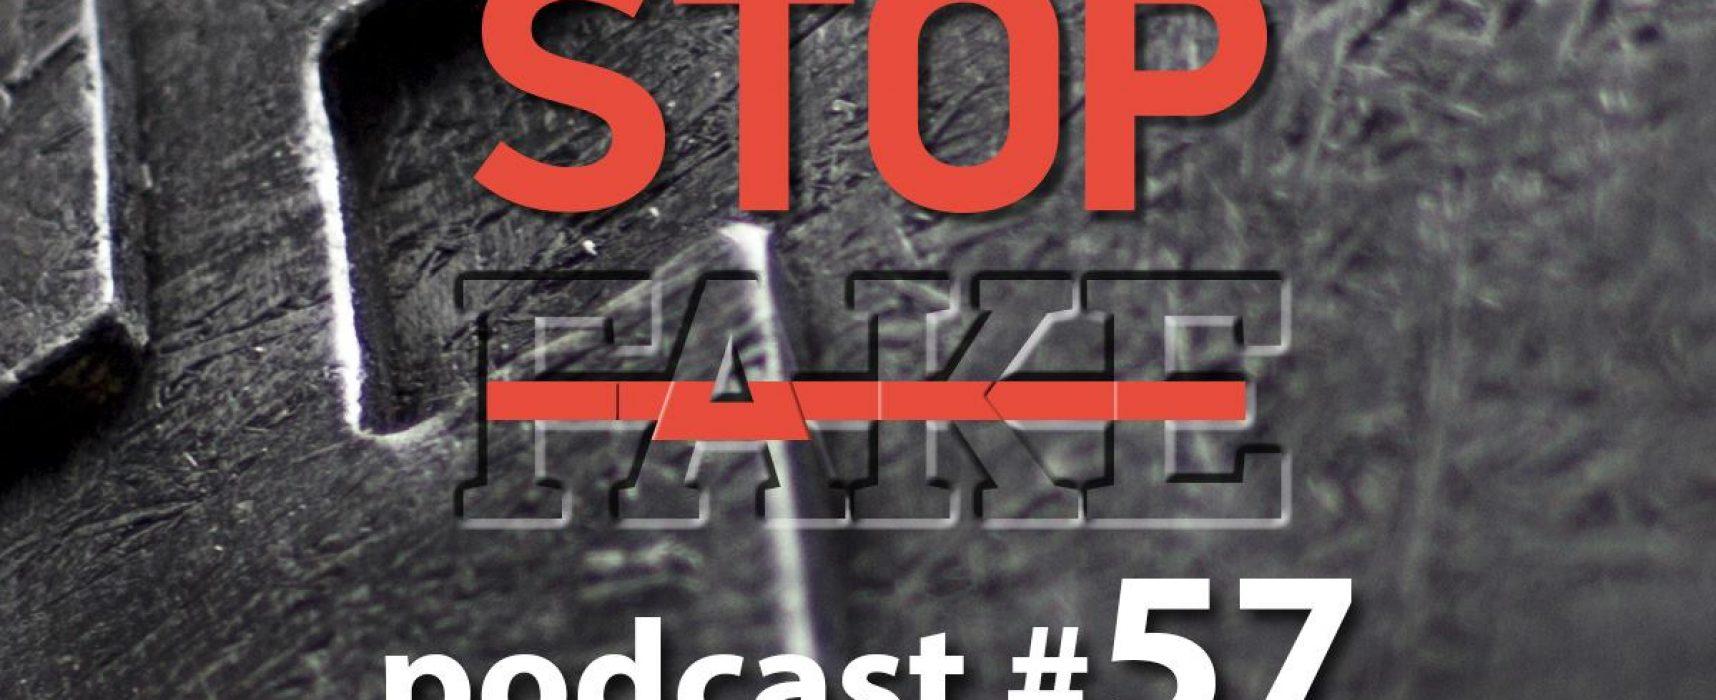 StopFake podcast #57